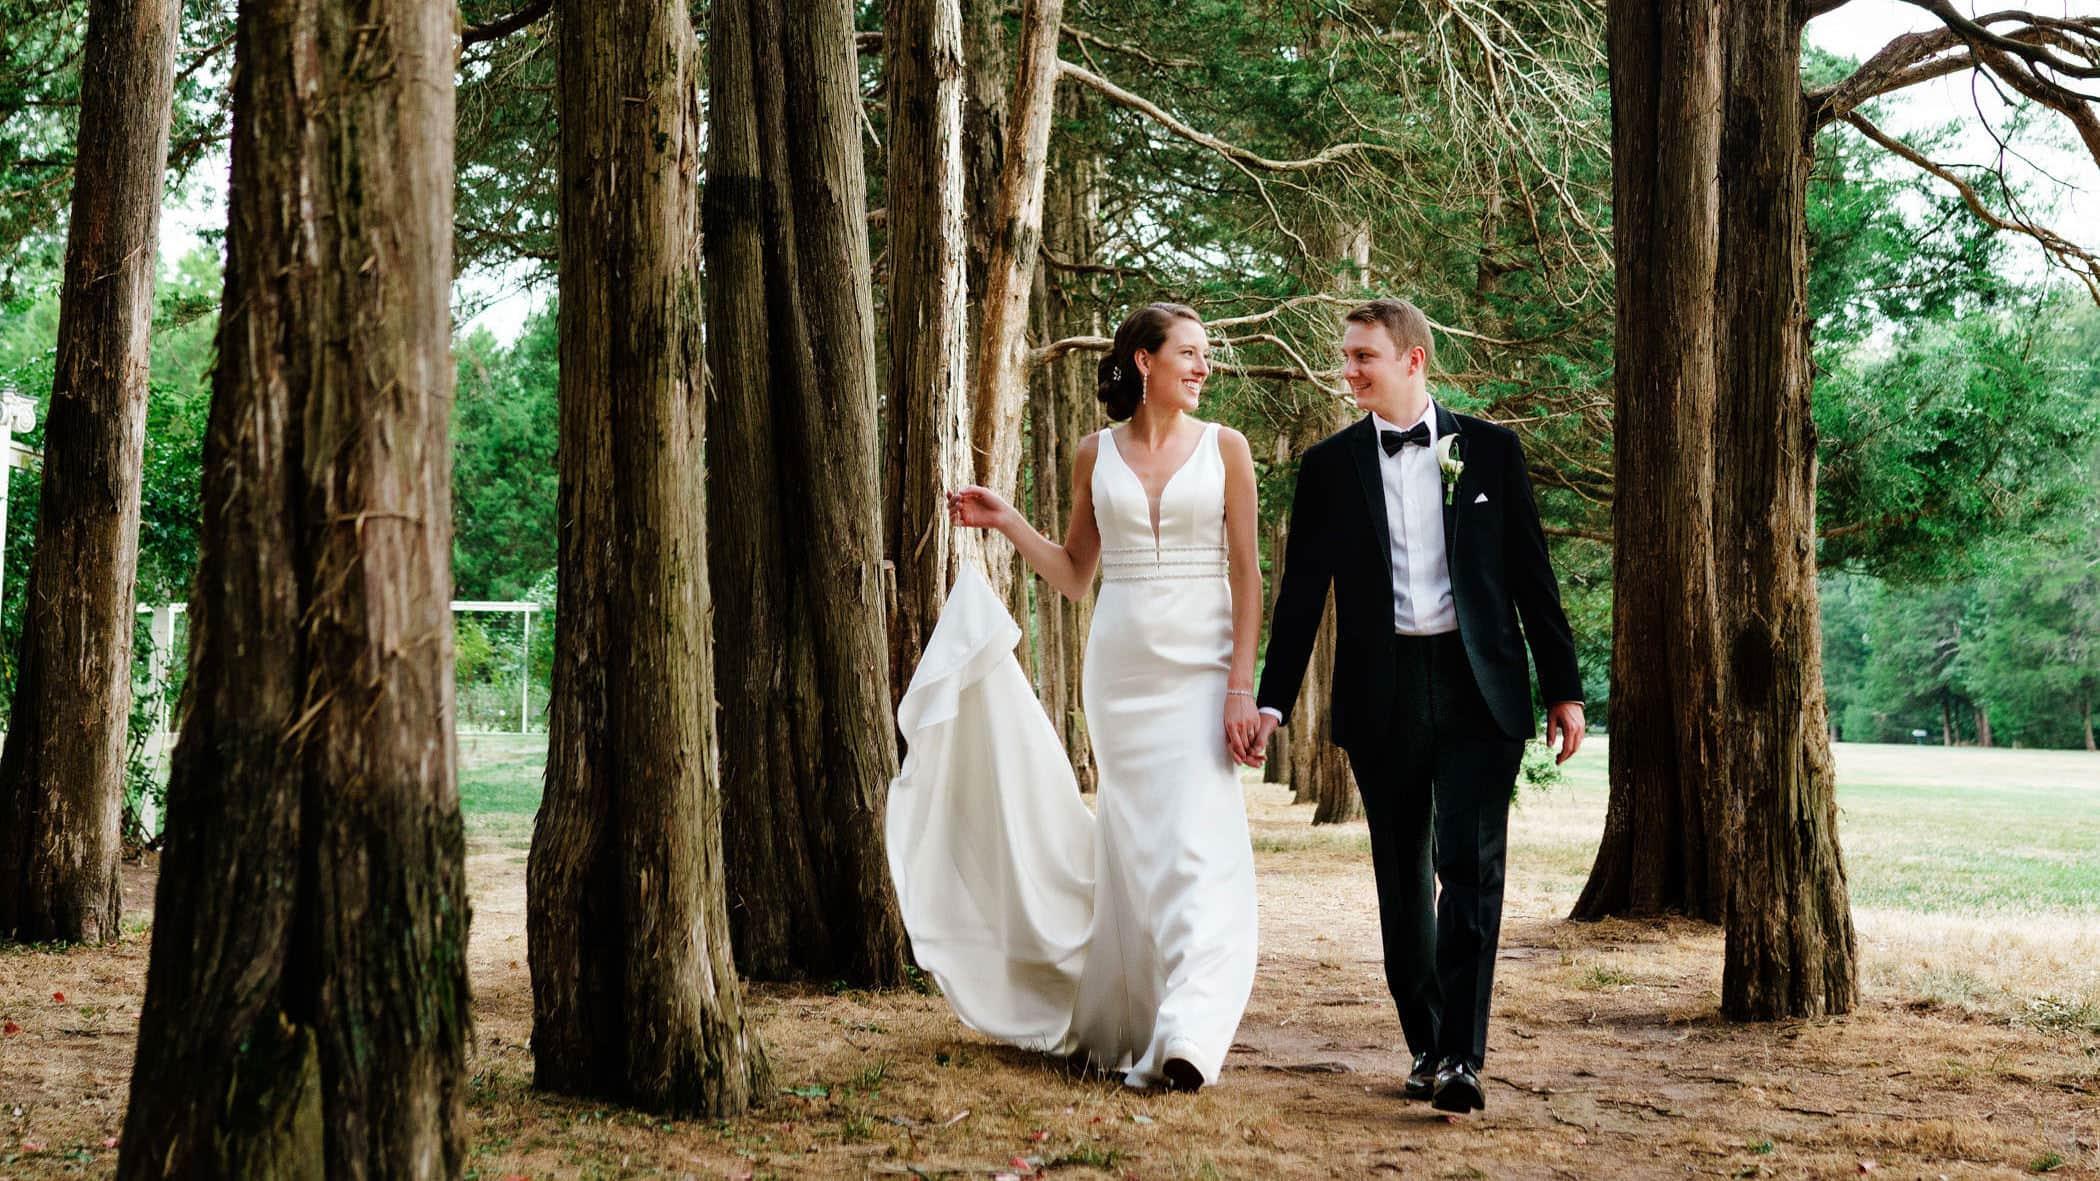 wardsworth-mansion-summer-wedding-photos-1